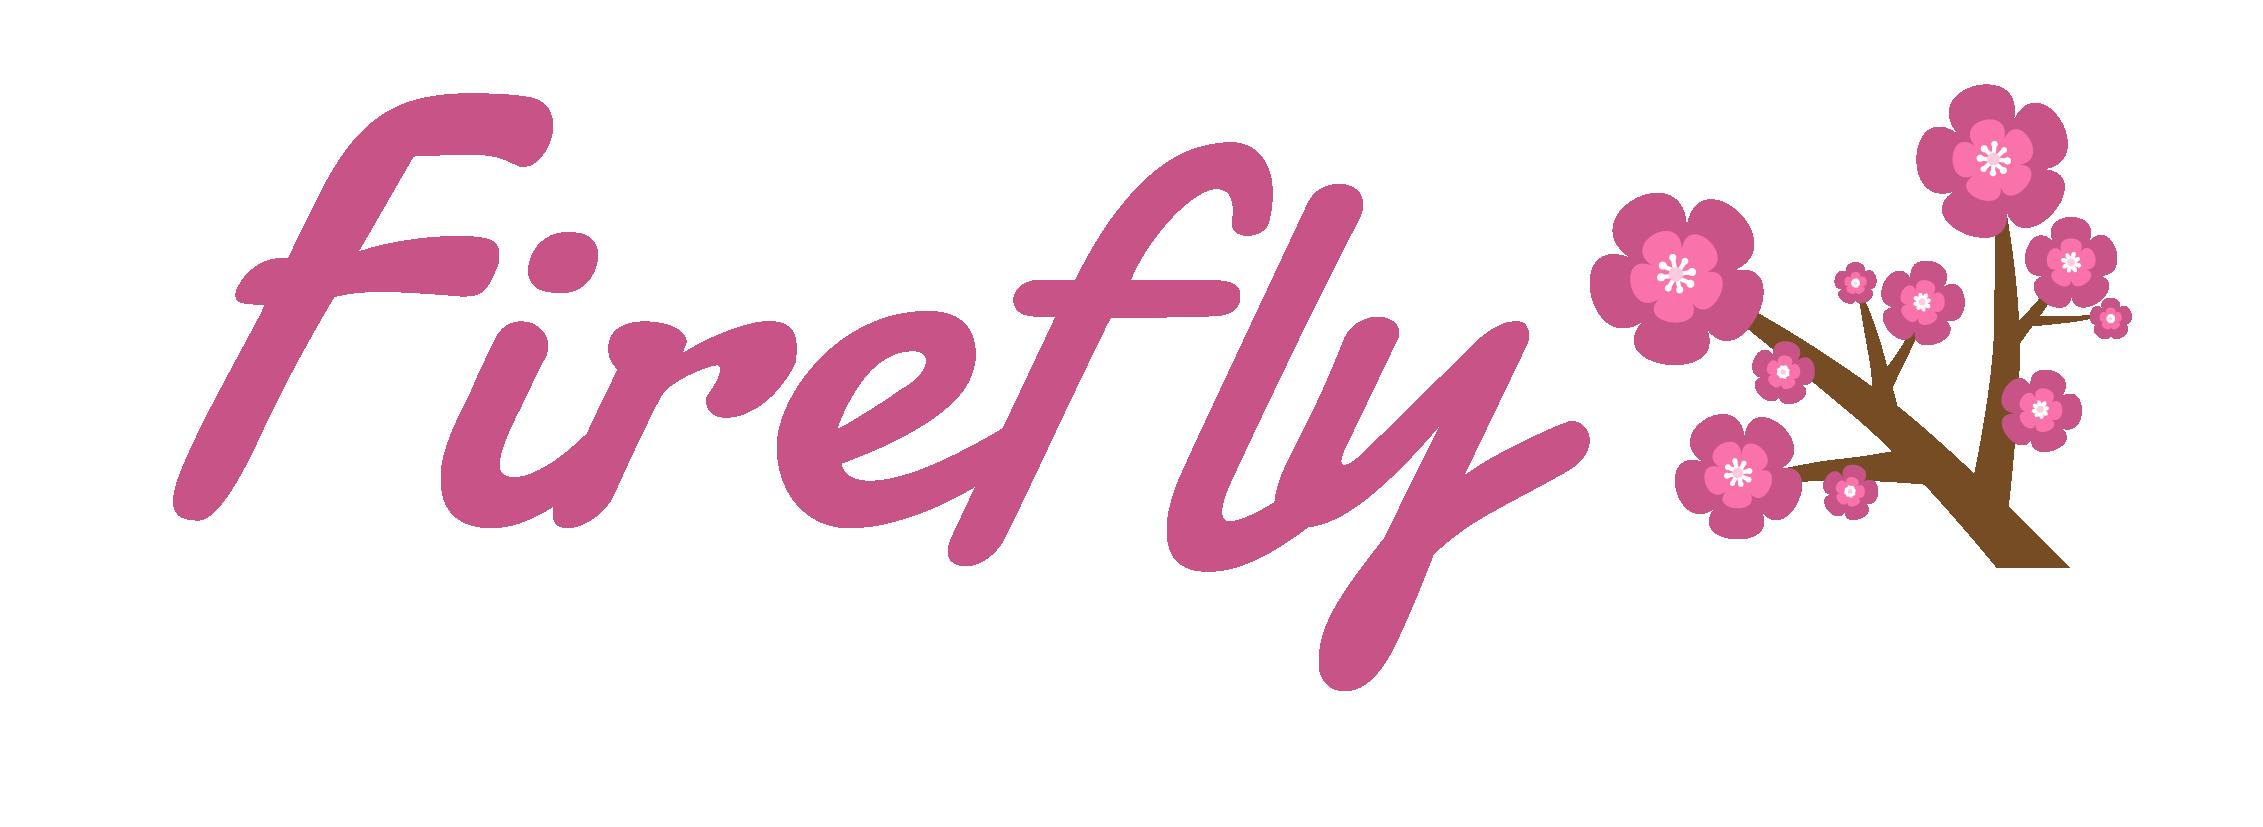 firefly_final-02